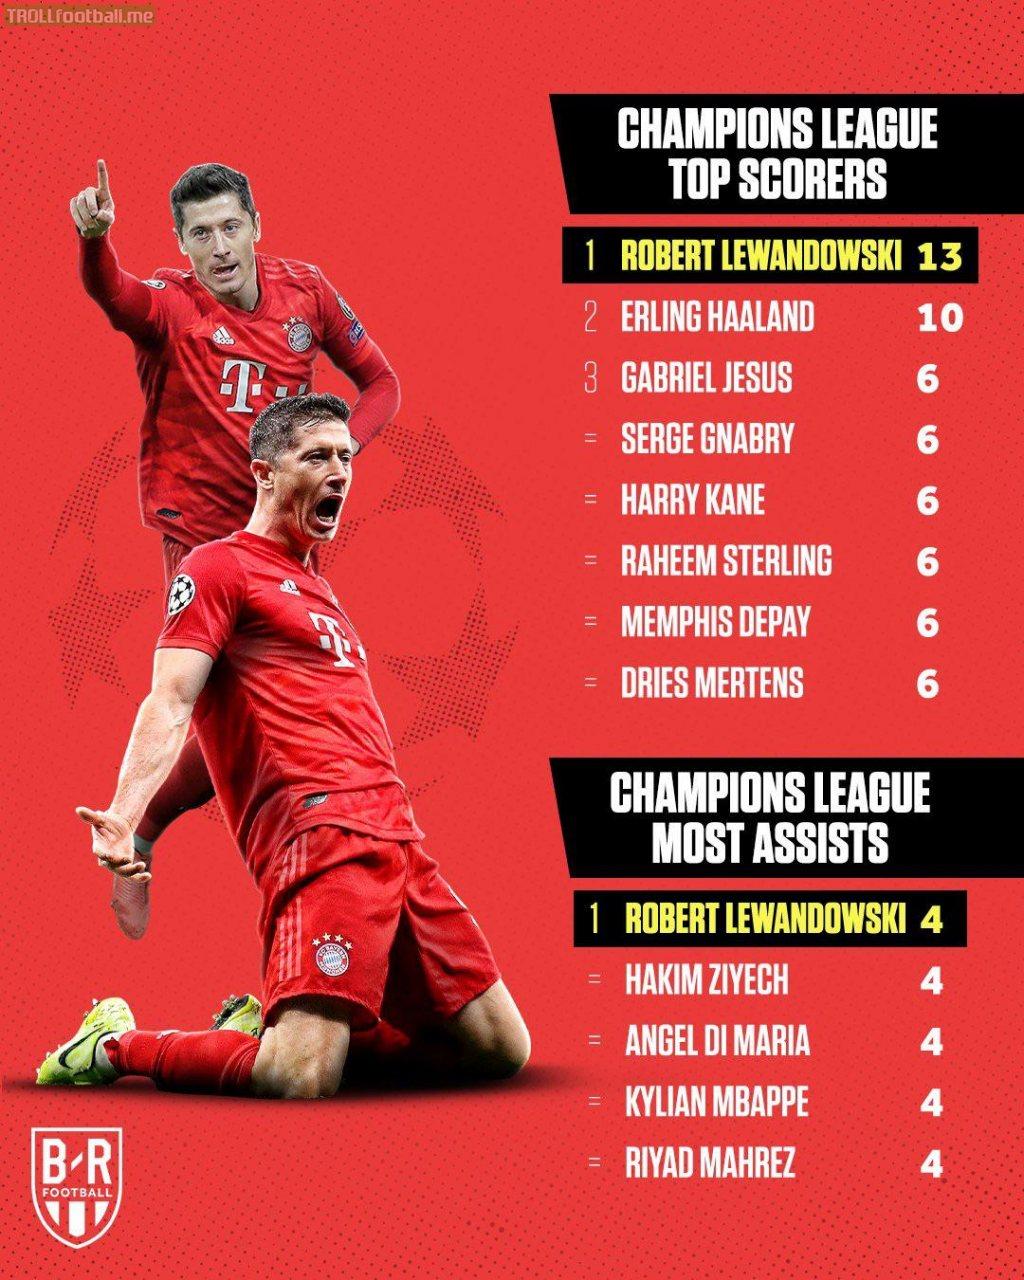 Lewandowski *so far* this season is the UCL's top goal scorer and assister.